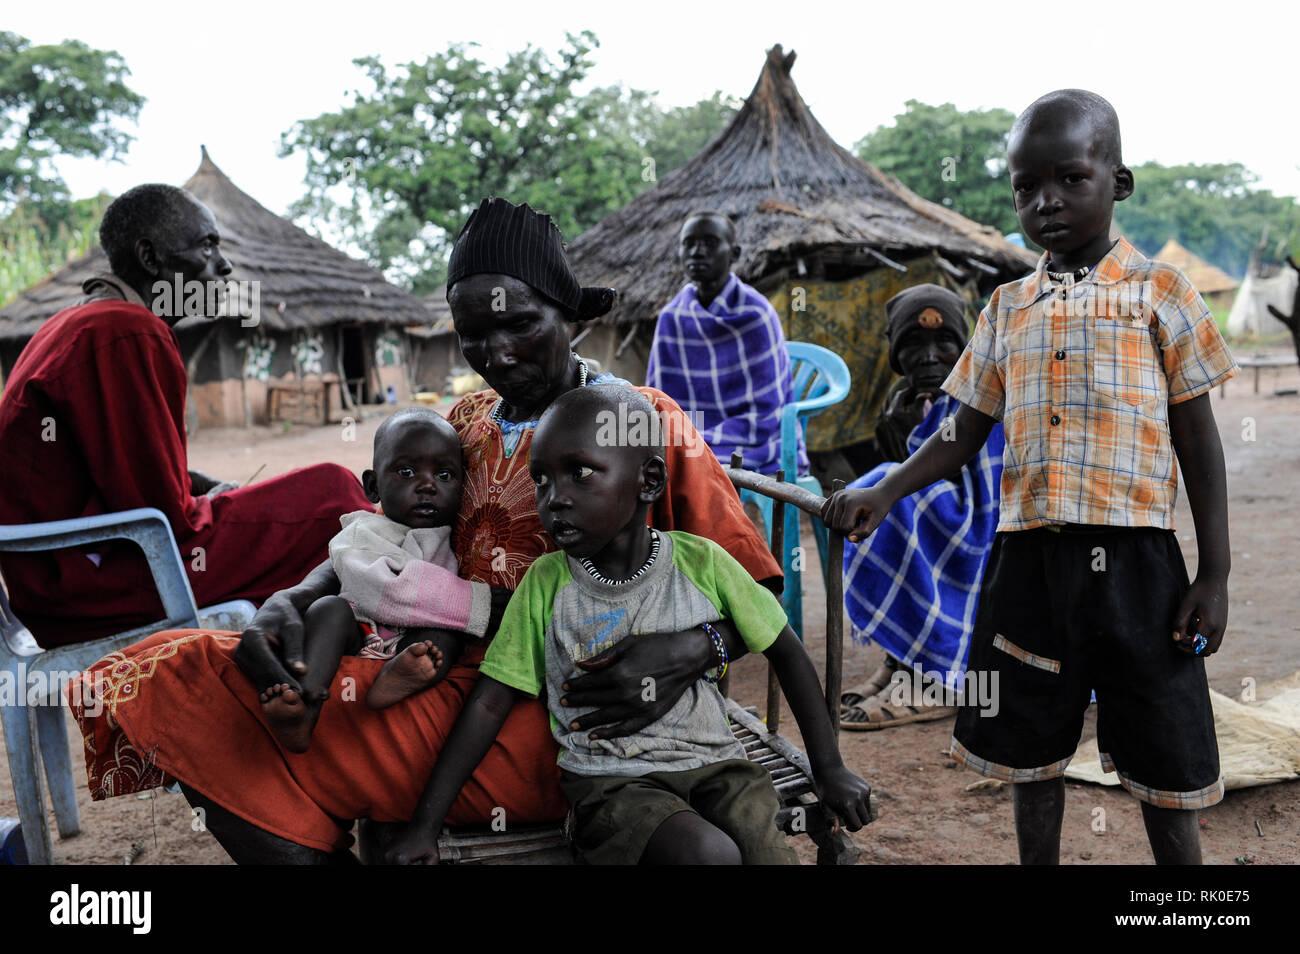 SOUTH SUDAN, Lakes State, village Mapuordit, Dinka family with five children/ SUED-SUDAN, Bahr el Ghazal region , Lakes State, Dorf Mapuordit, Dinka Familie mit Kindern - Stock Image